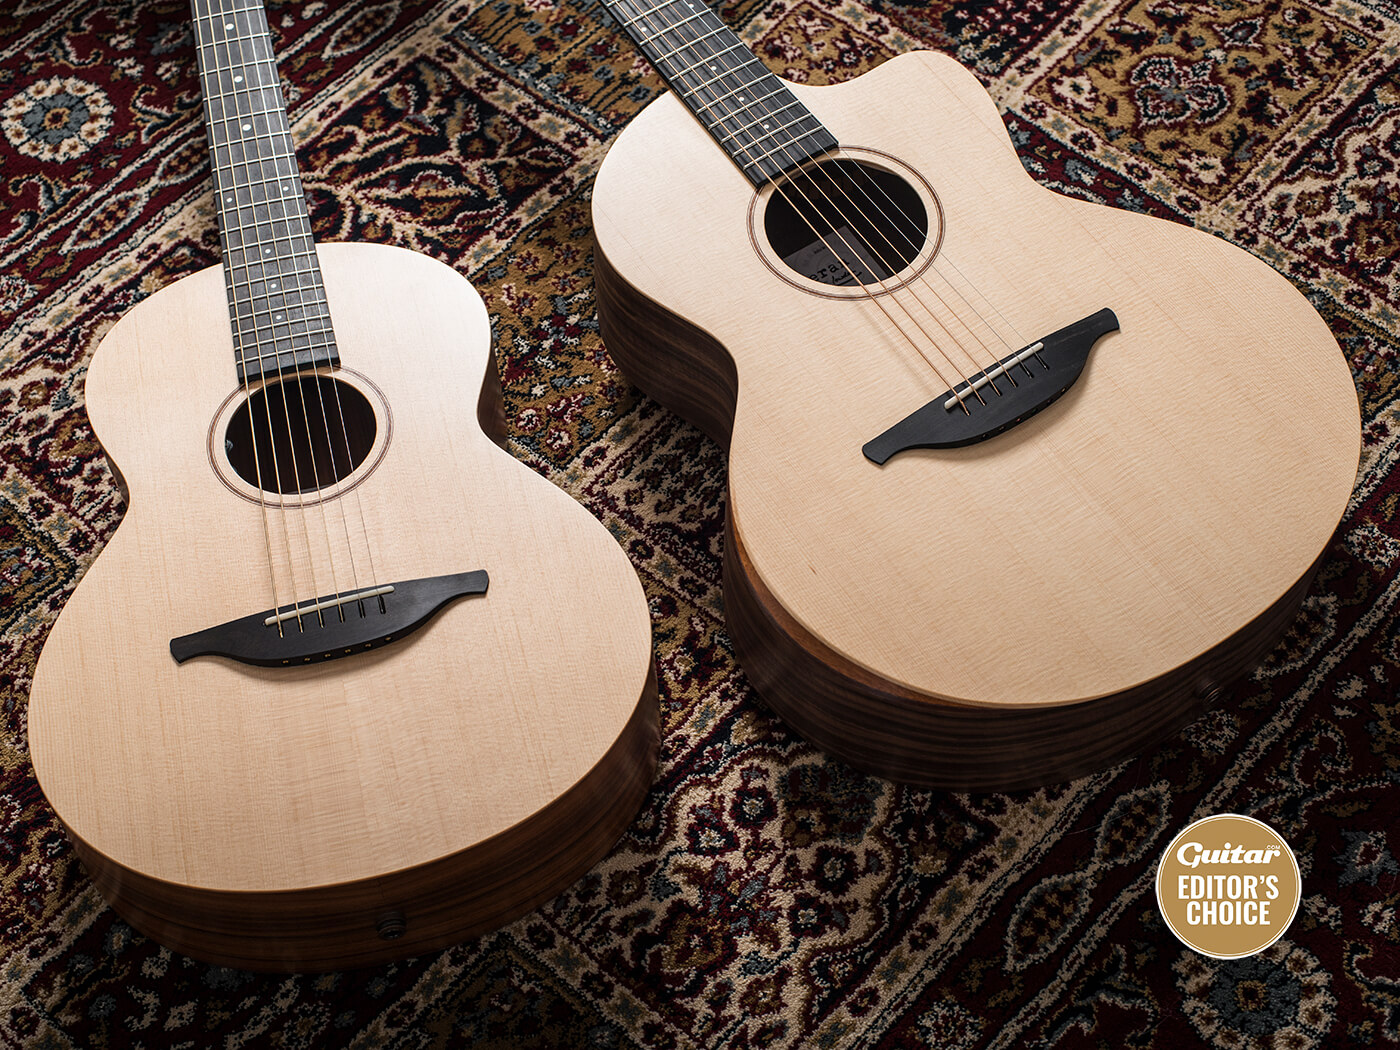 Review: Sheeran by Lowden W02 & S04 acoustics - Guitar com